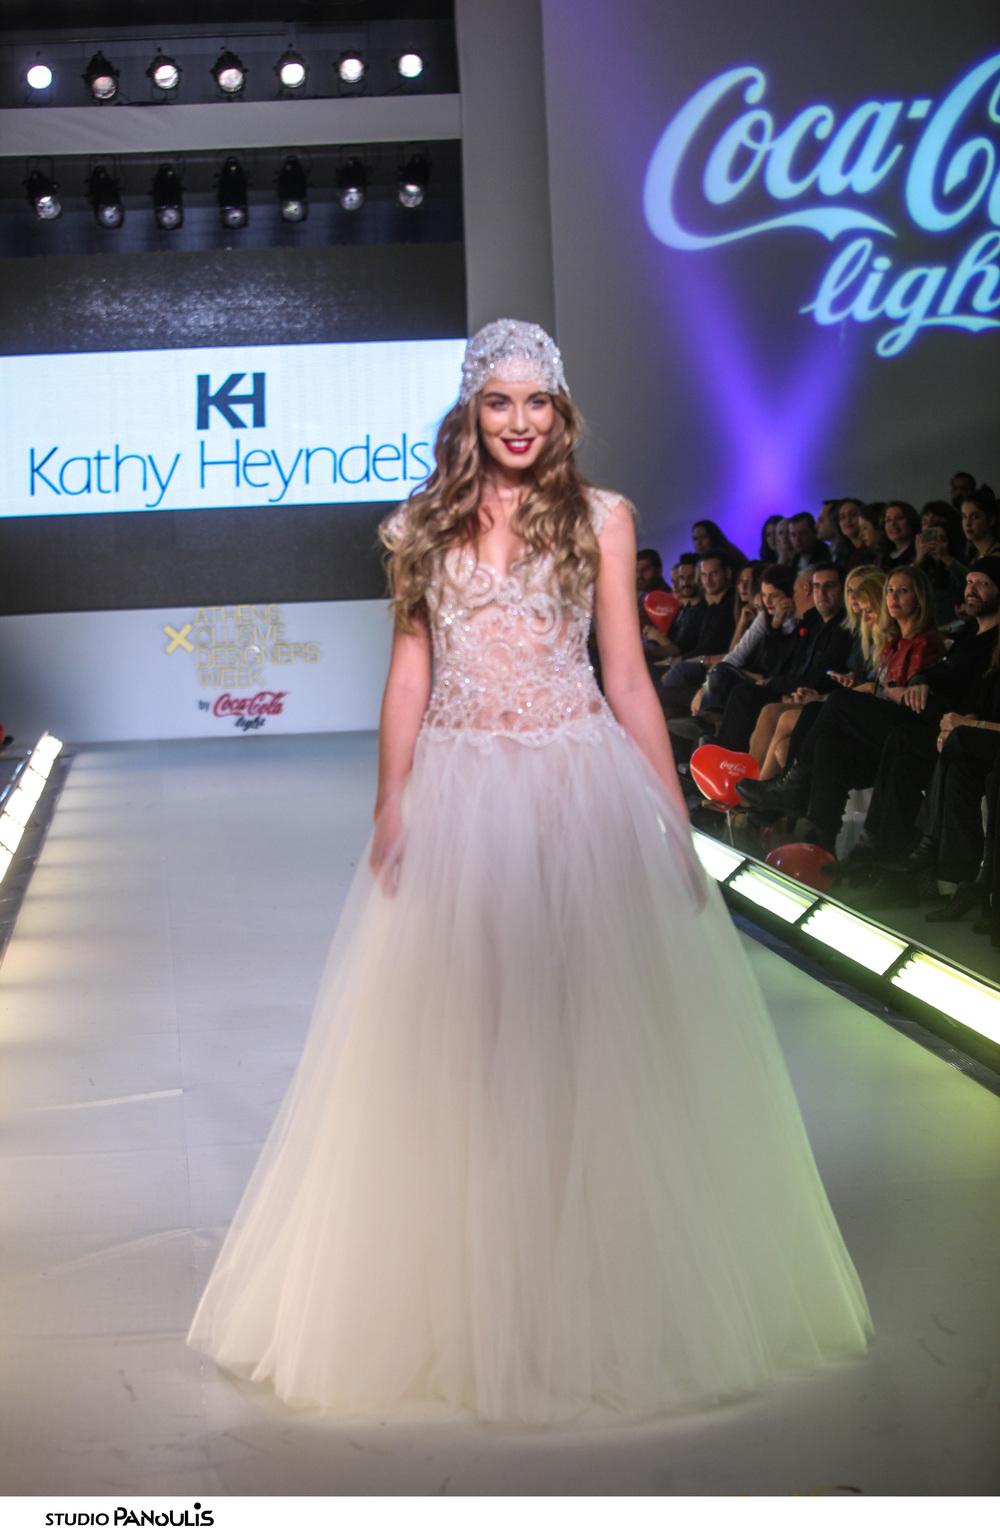 KATHY HEYNDELS/Catwalk